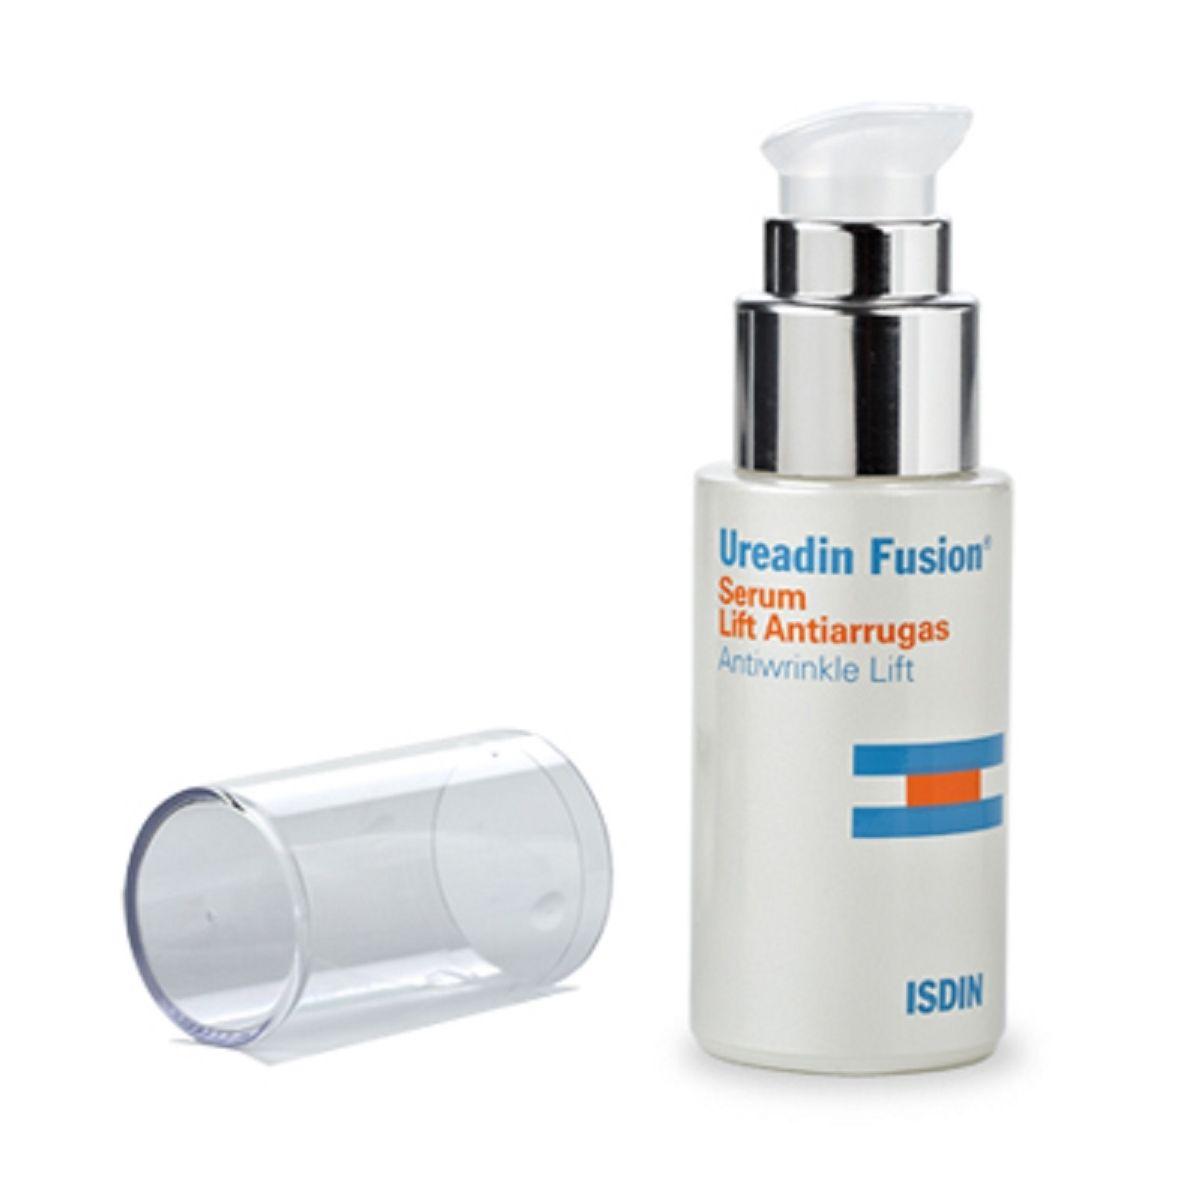 Ureadin Fusion Serum Lift Lab Isdin Soap Dispenser Soap Dispenser